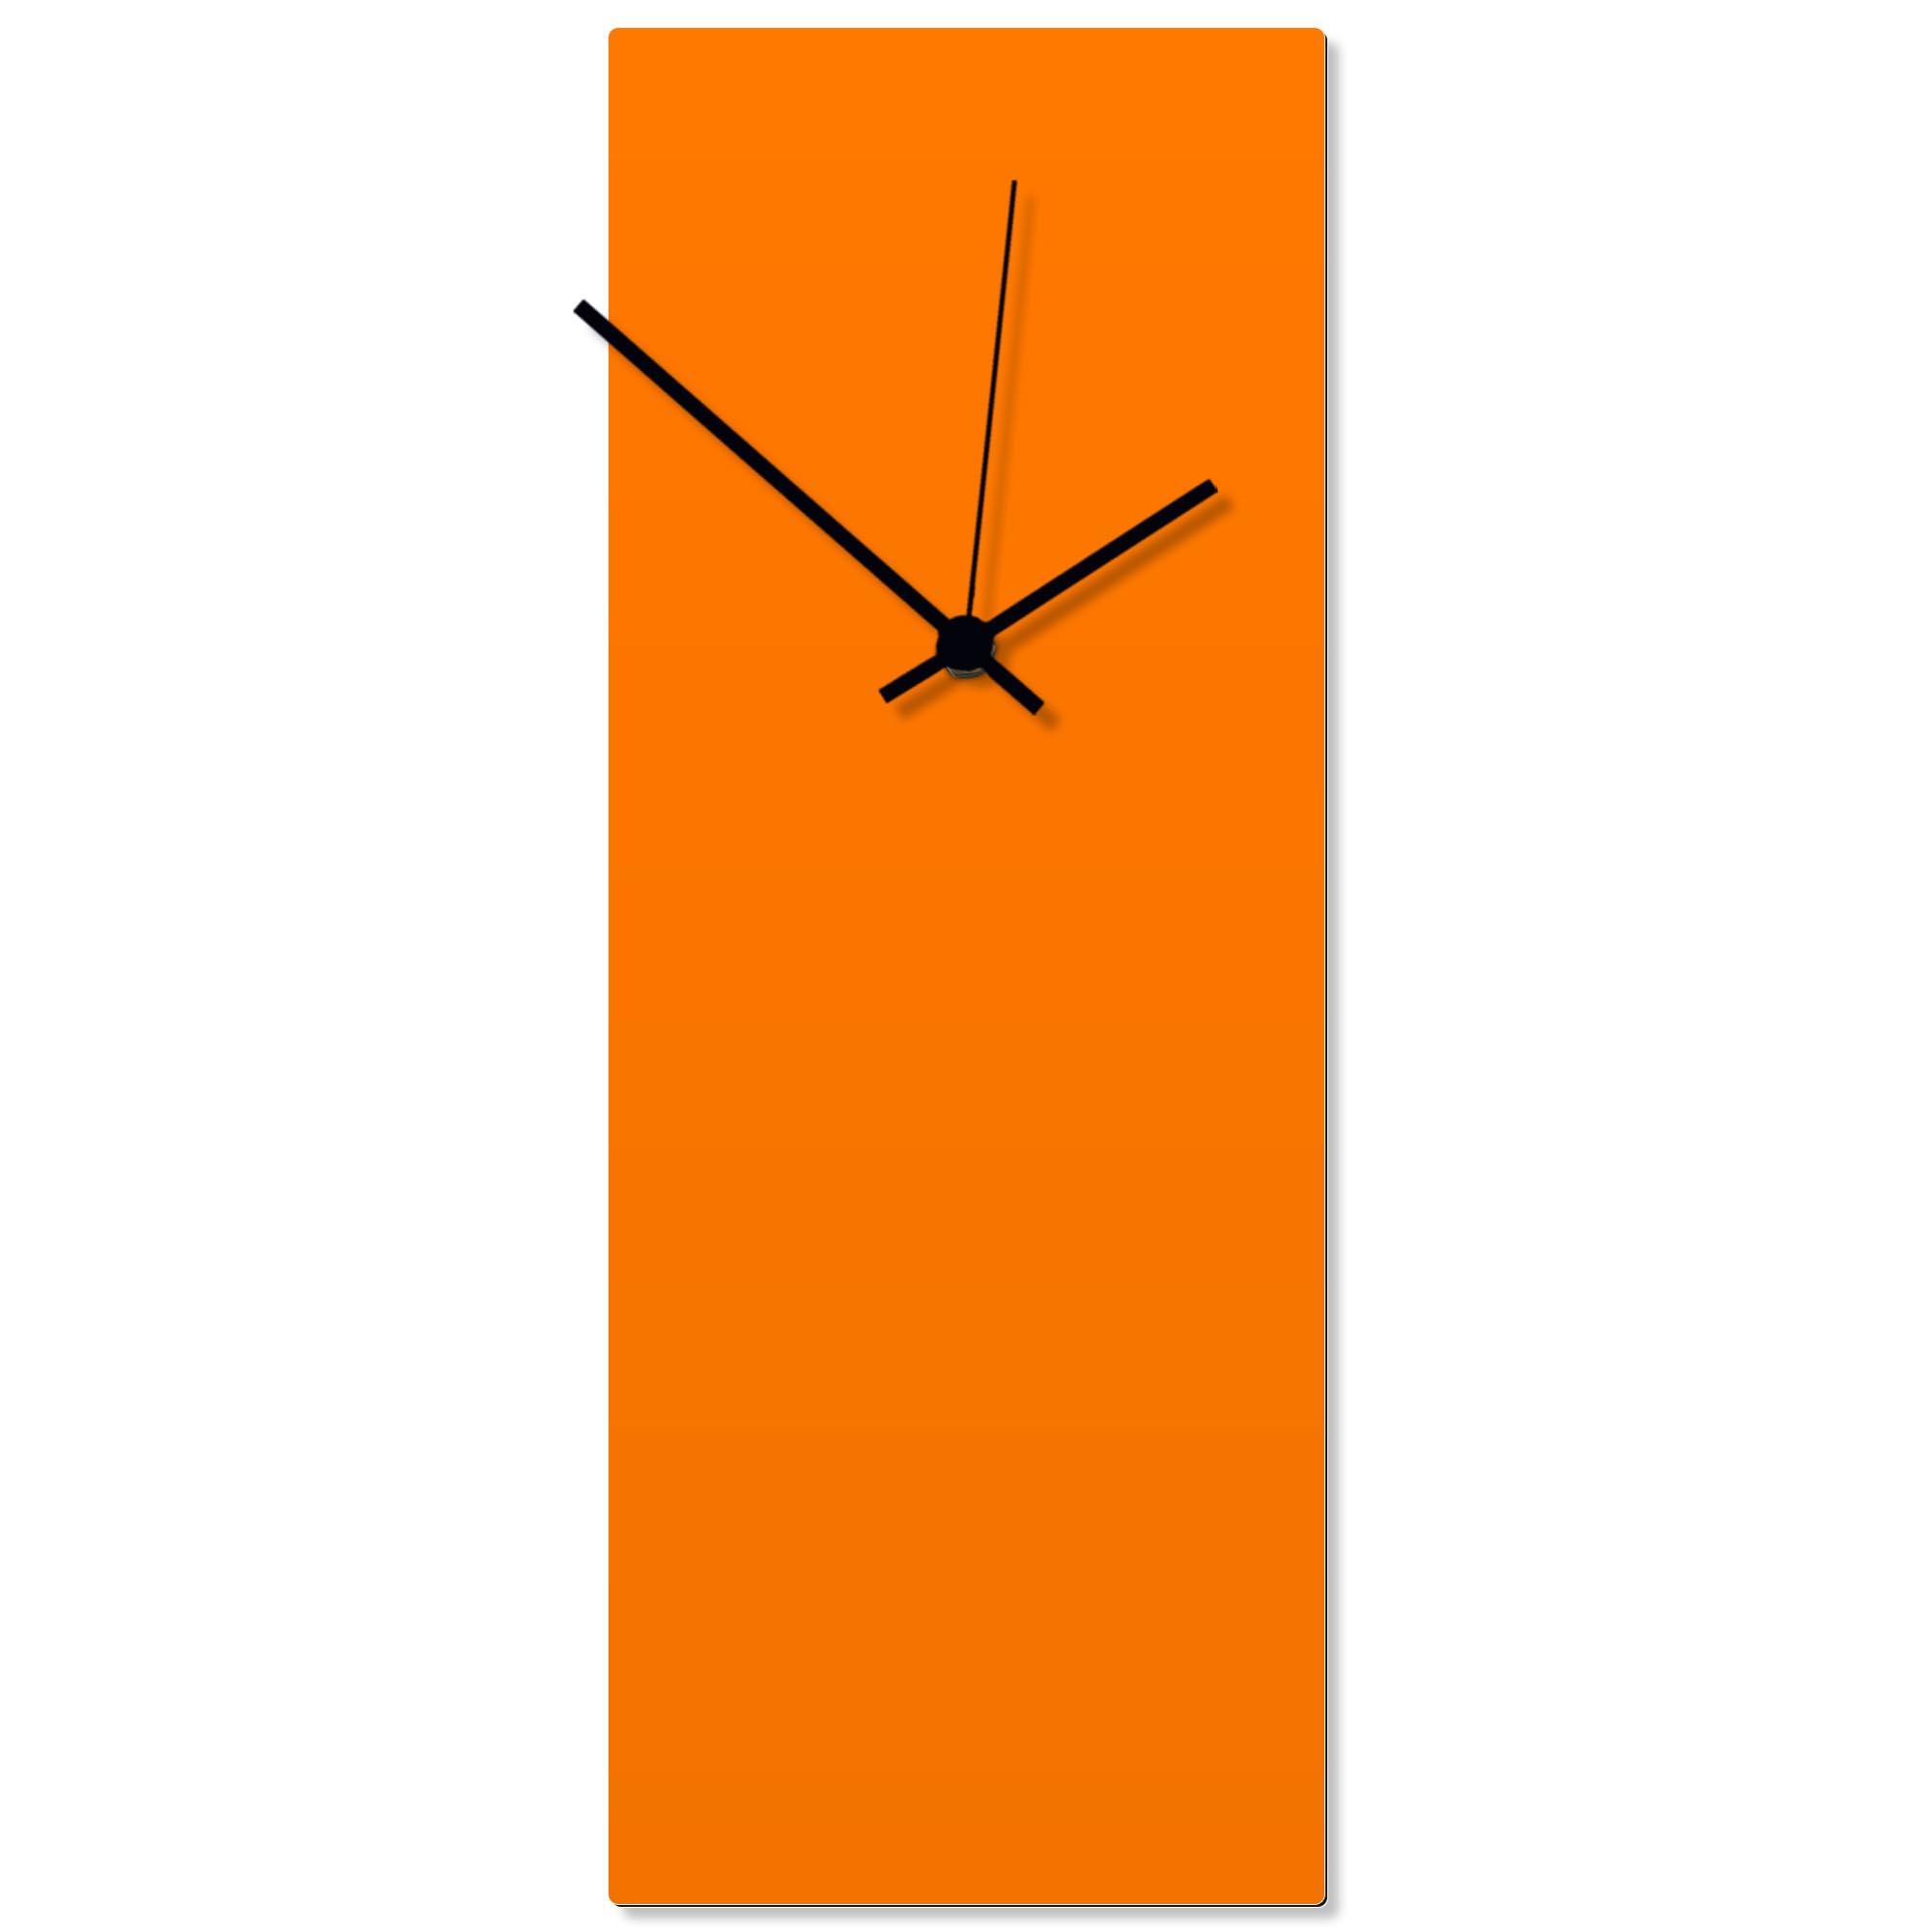 Orangeout Black Clock Large 8.25x22in. Aluminum Polymetal